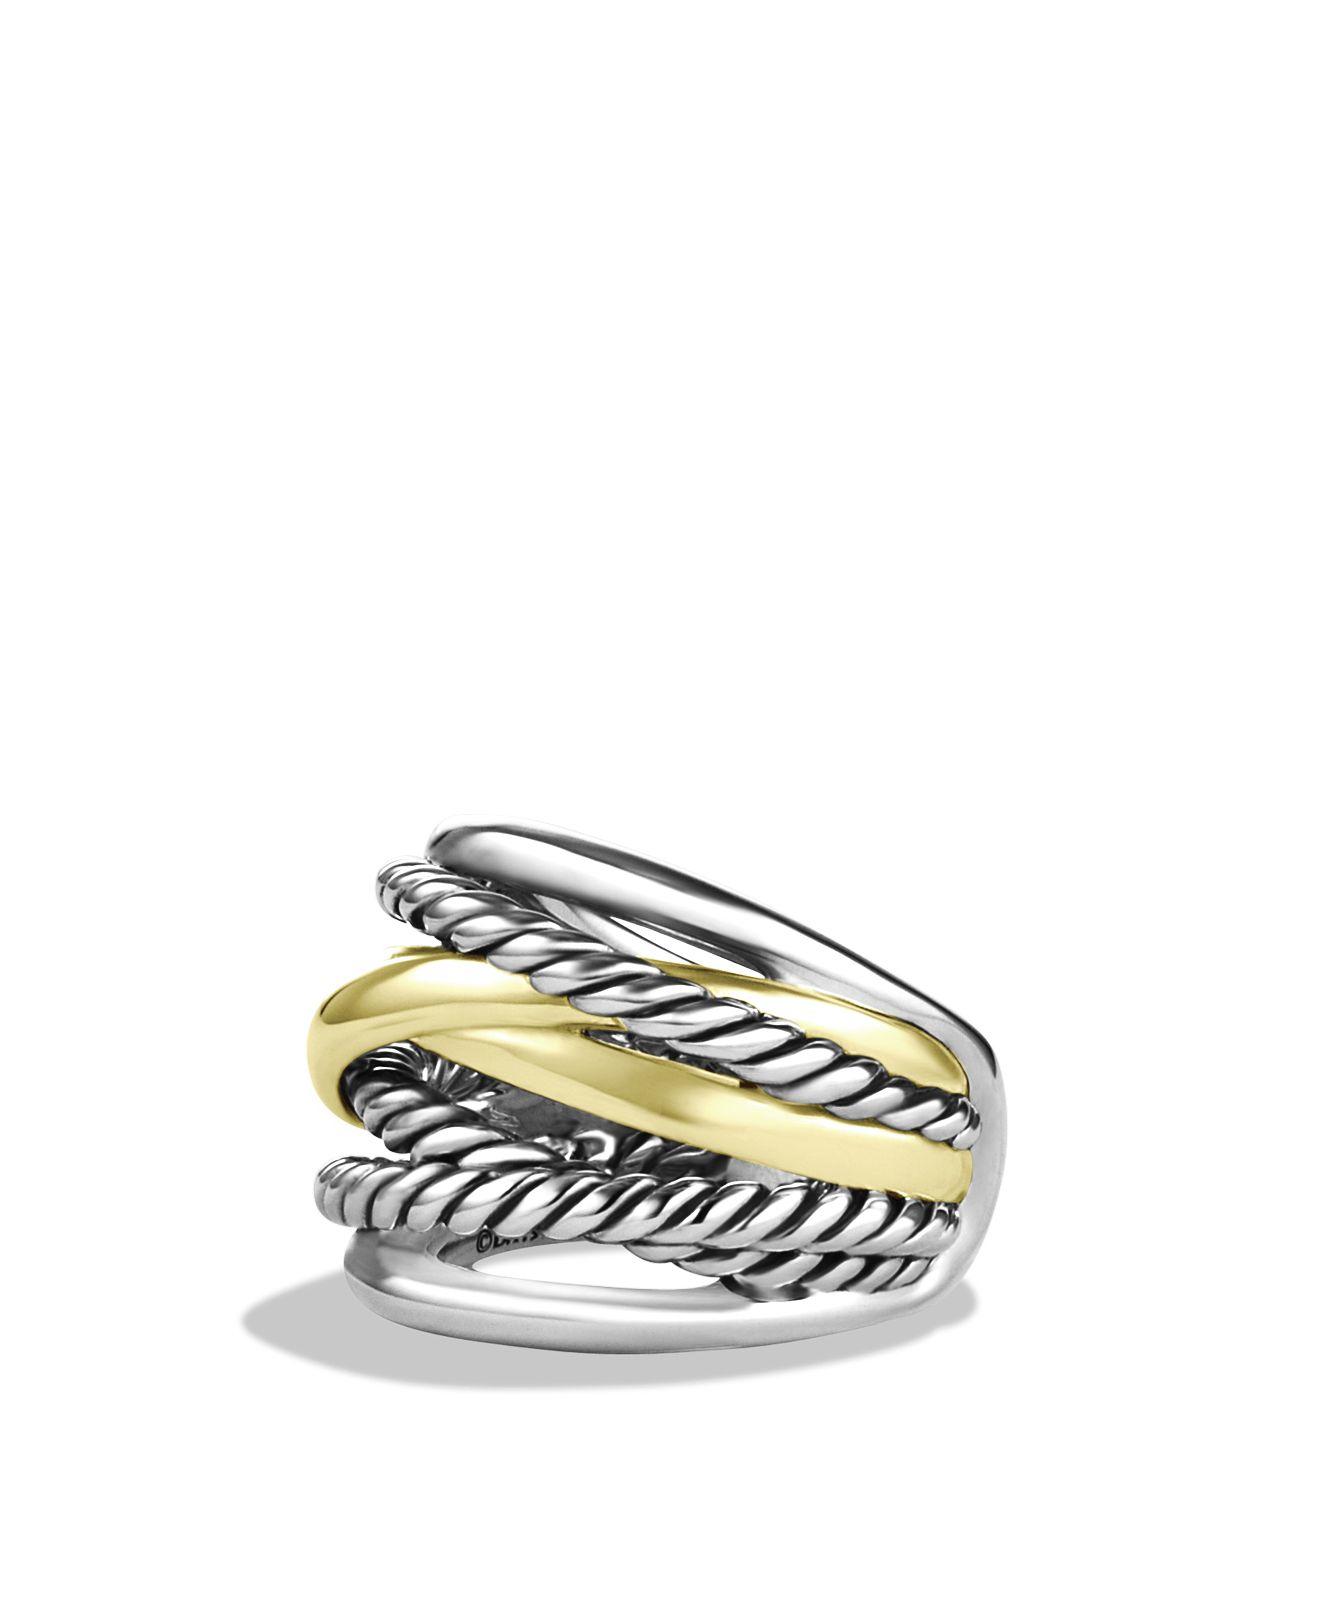 David Yurman Crossover Ring Sale